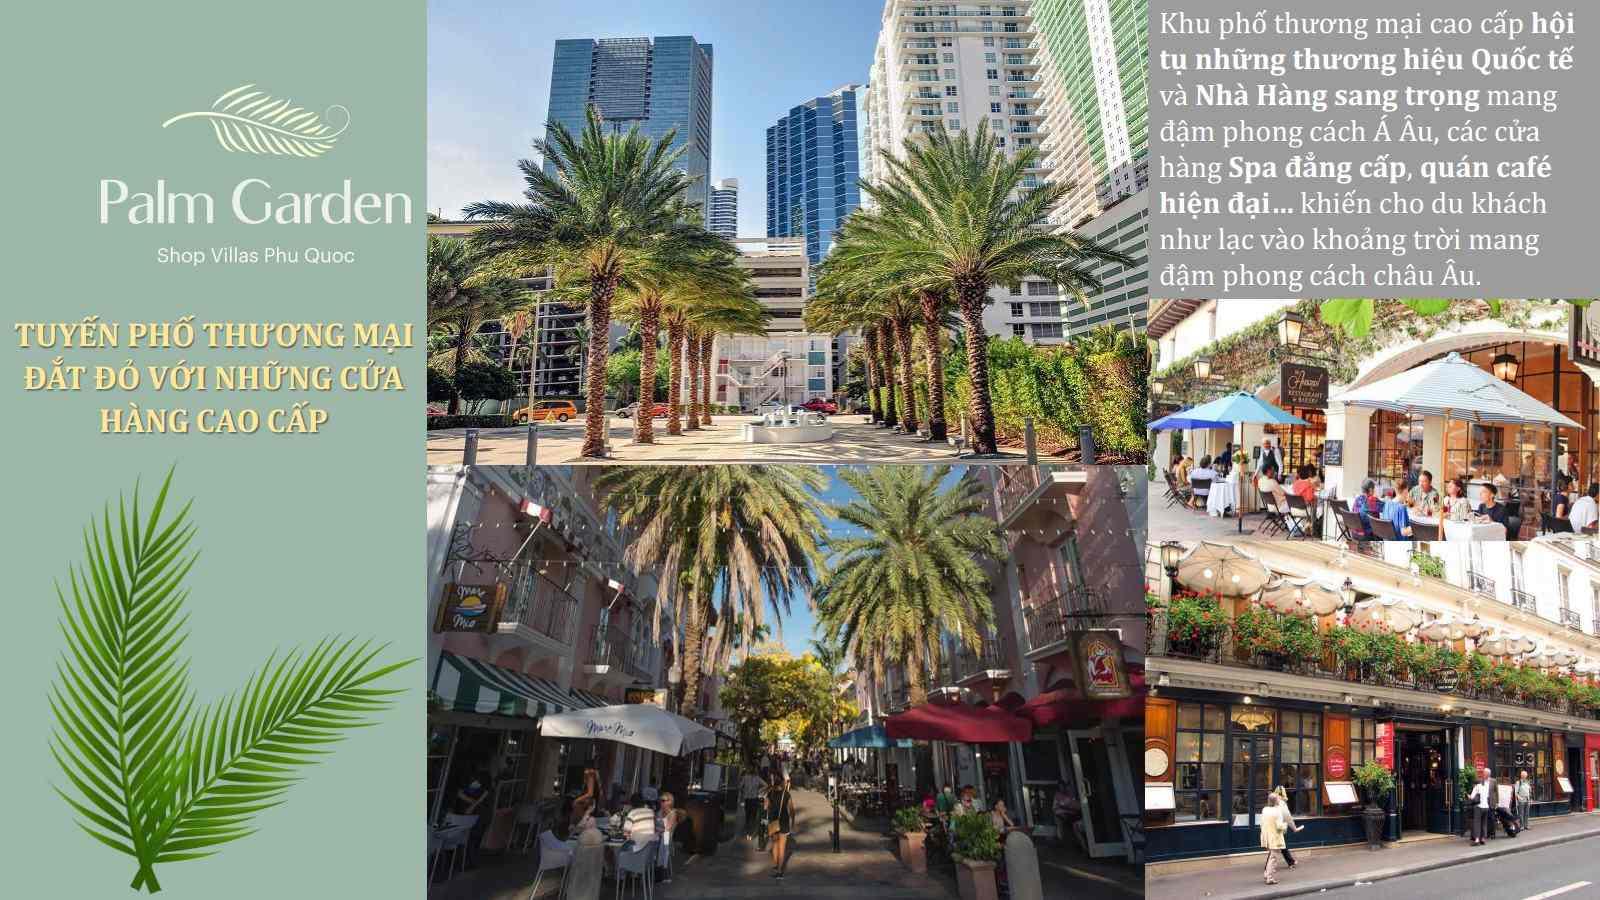 concept thiet ke palm garden phu quoc